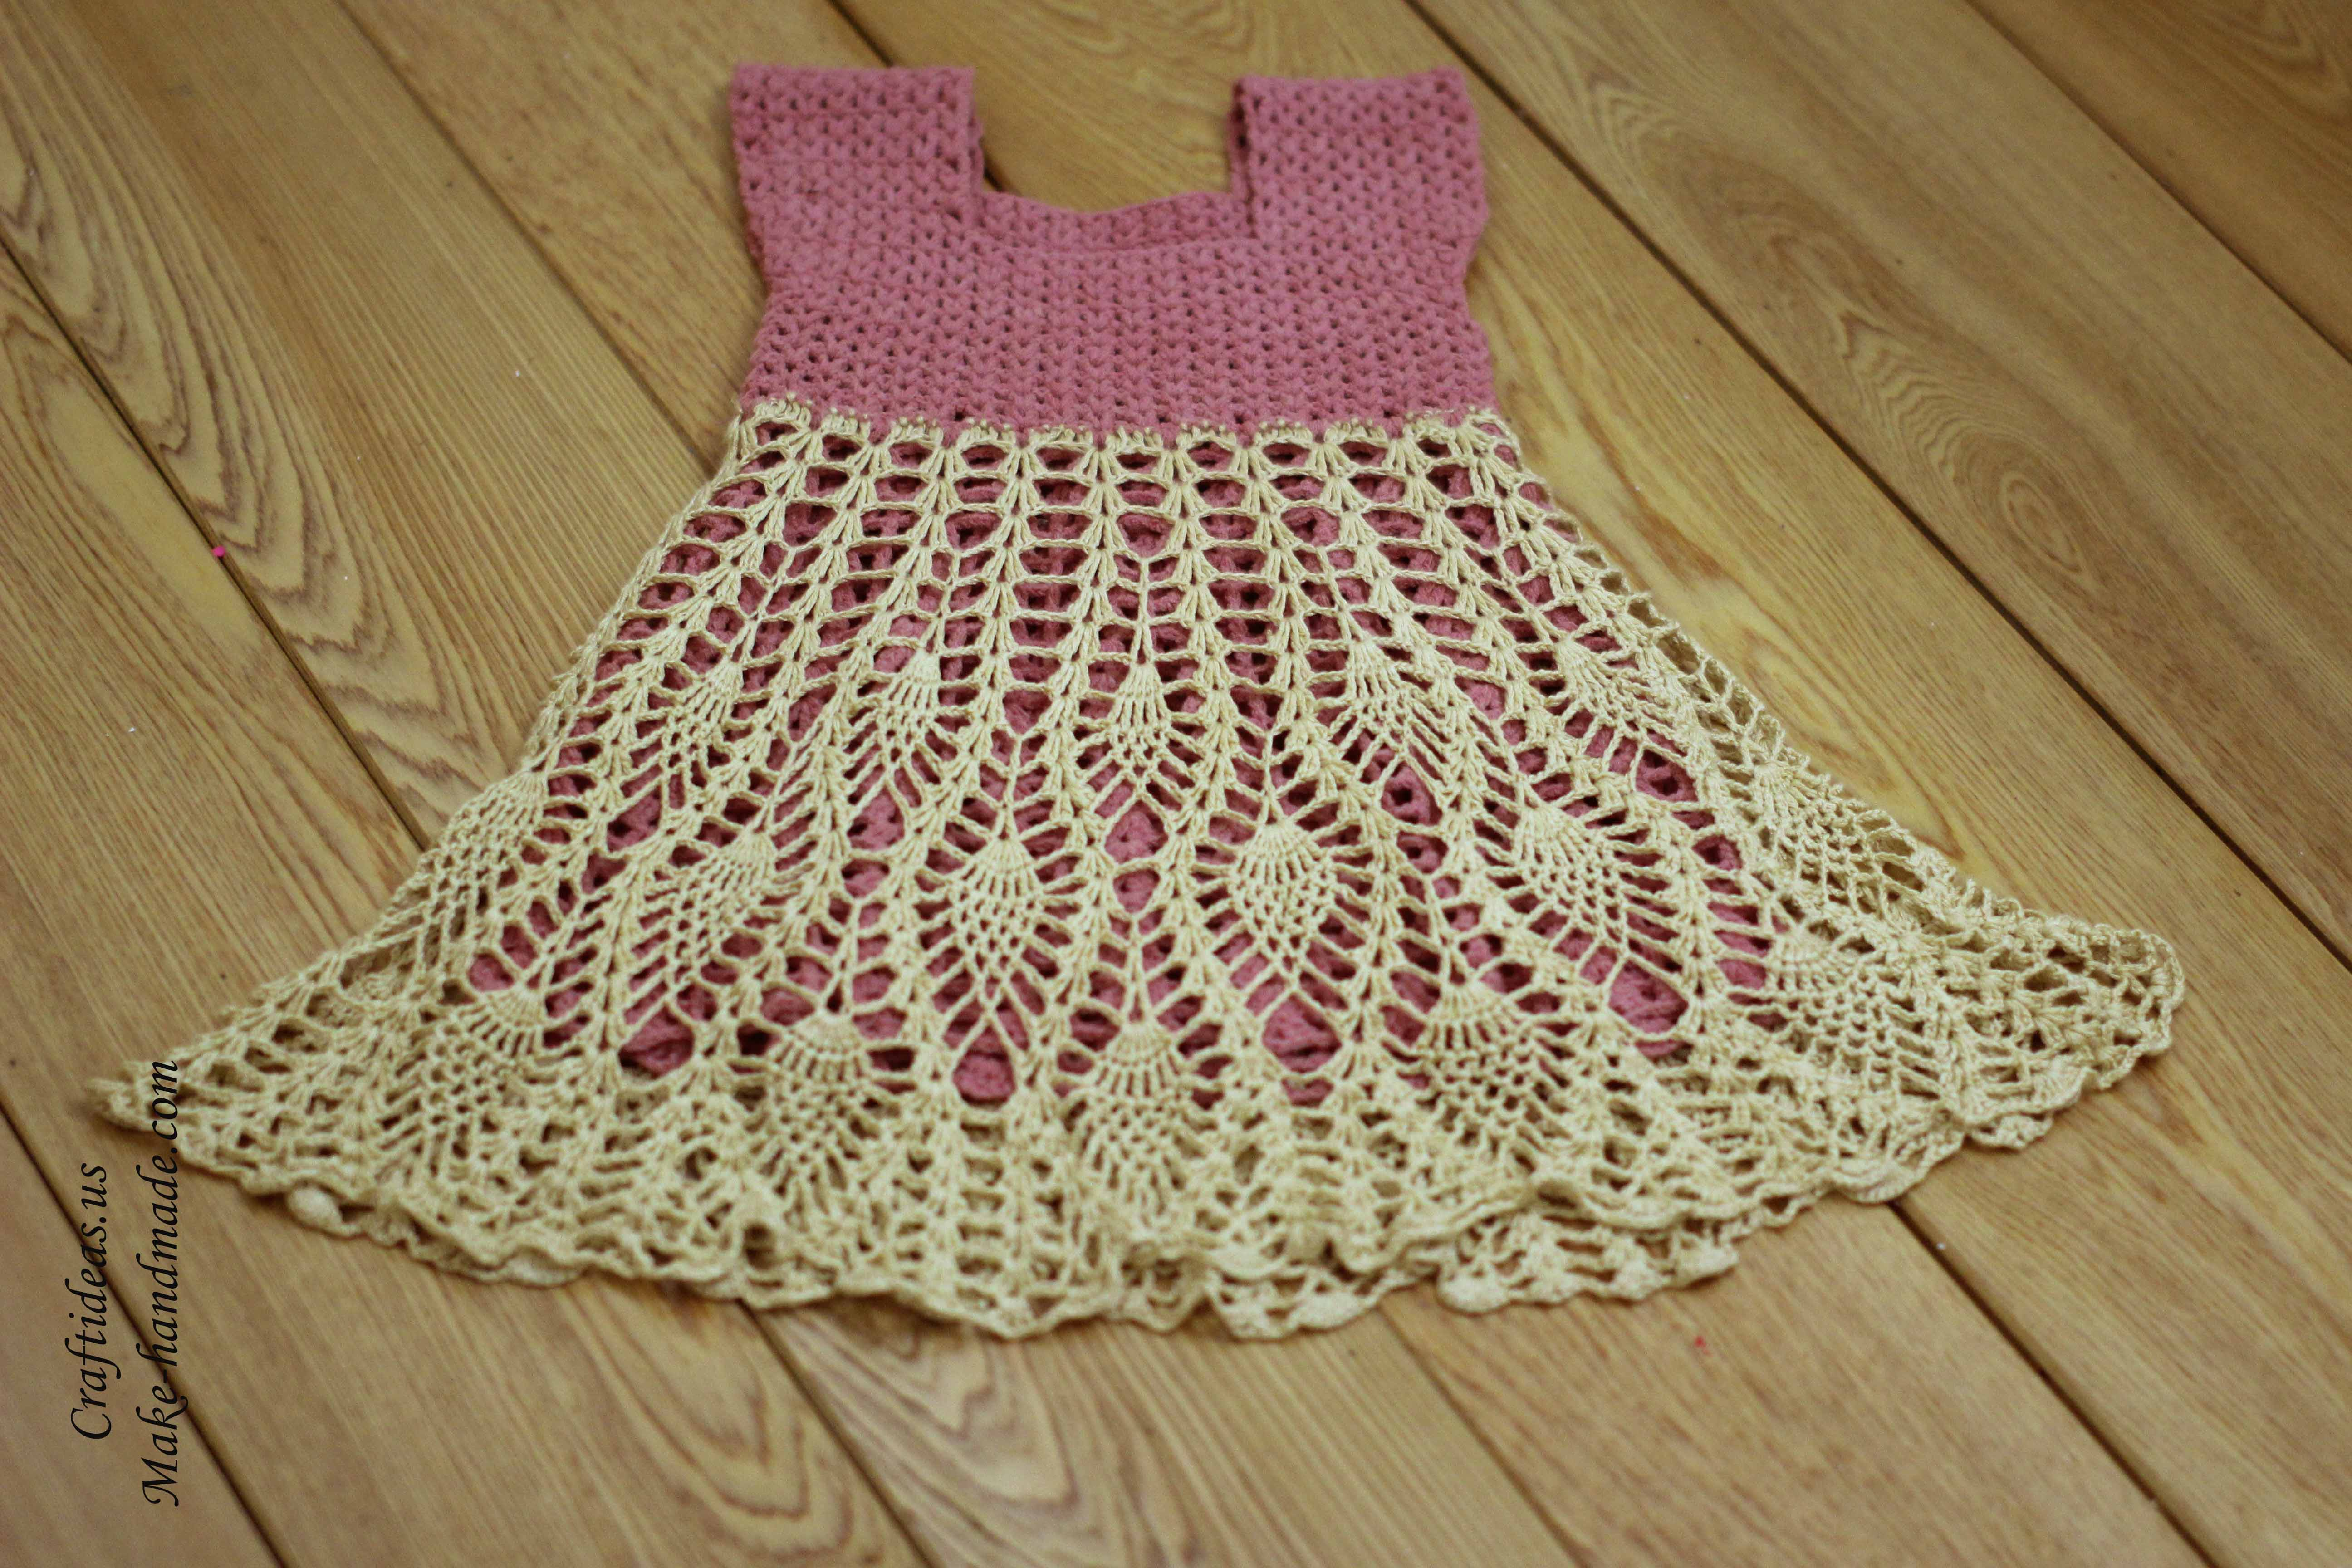 Crochet baby dress diagram images